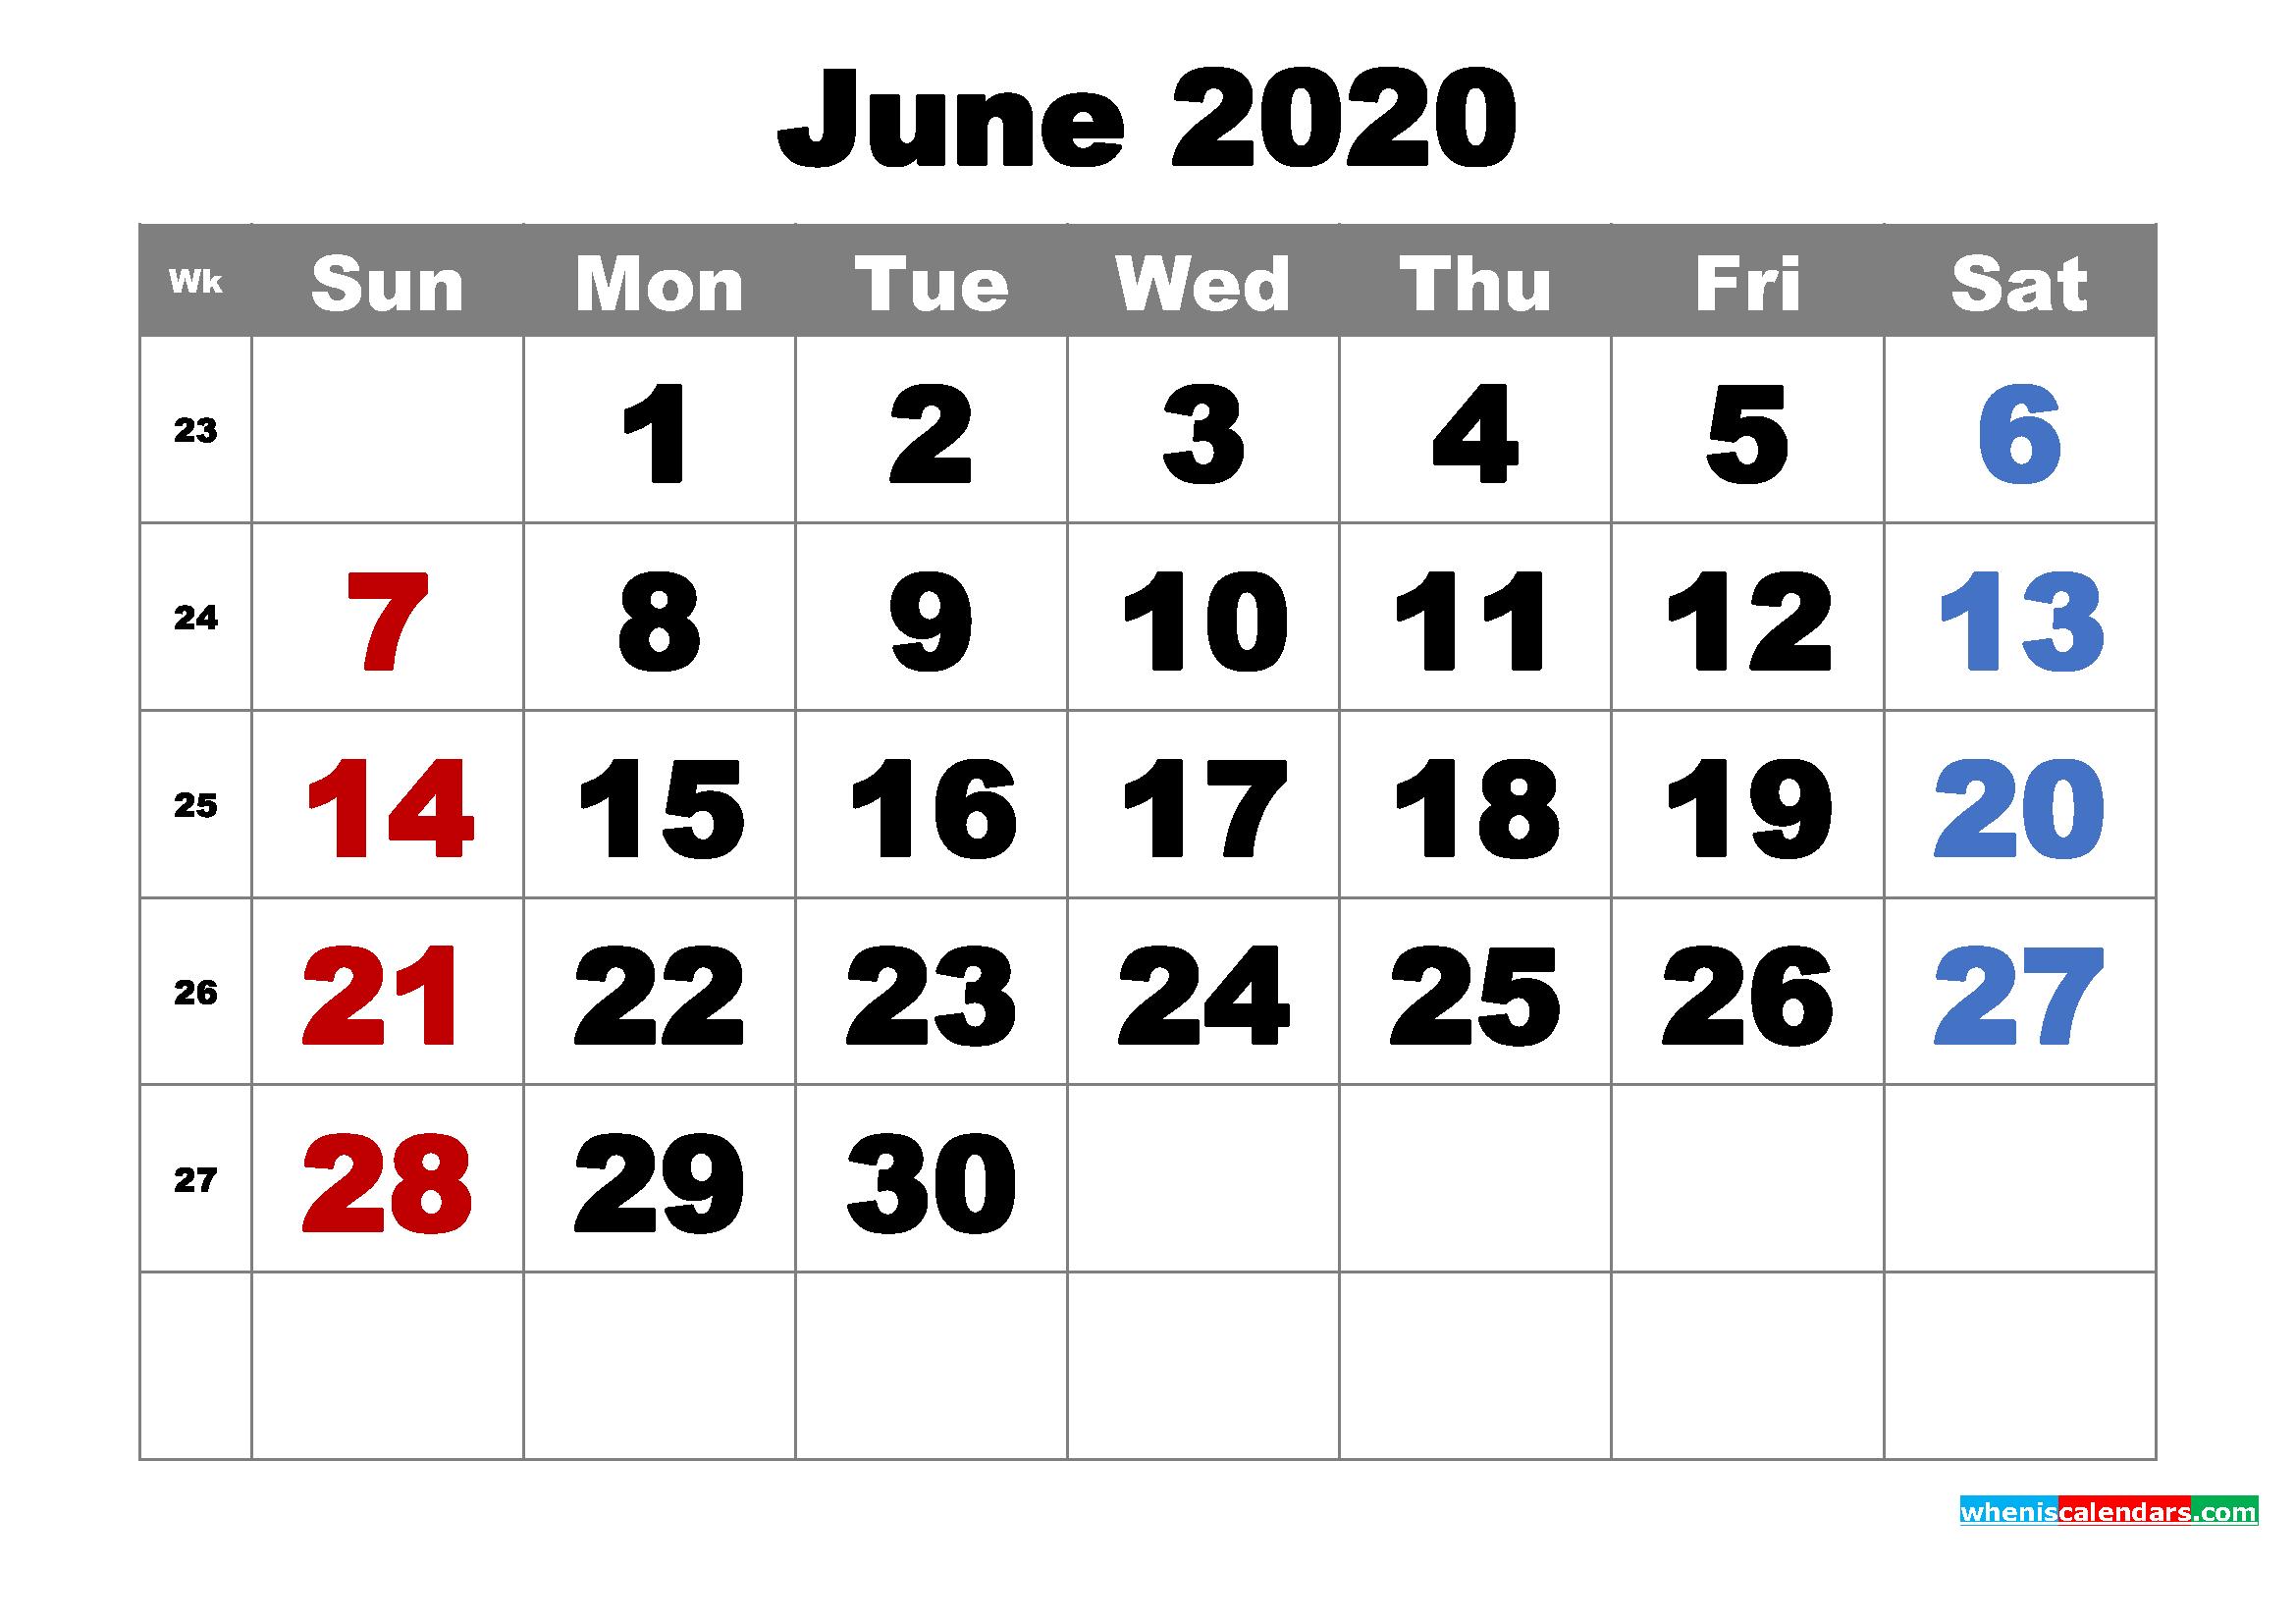 Free Printable June 2020 Calendar Word Pdf Image